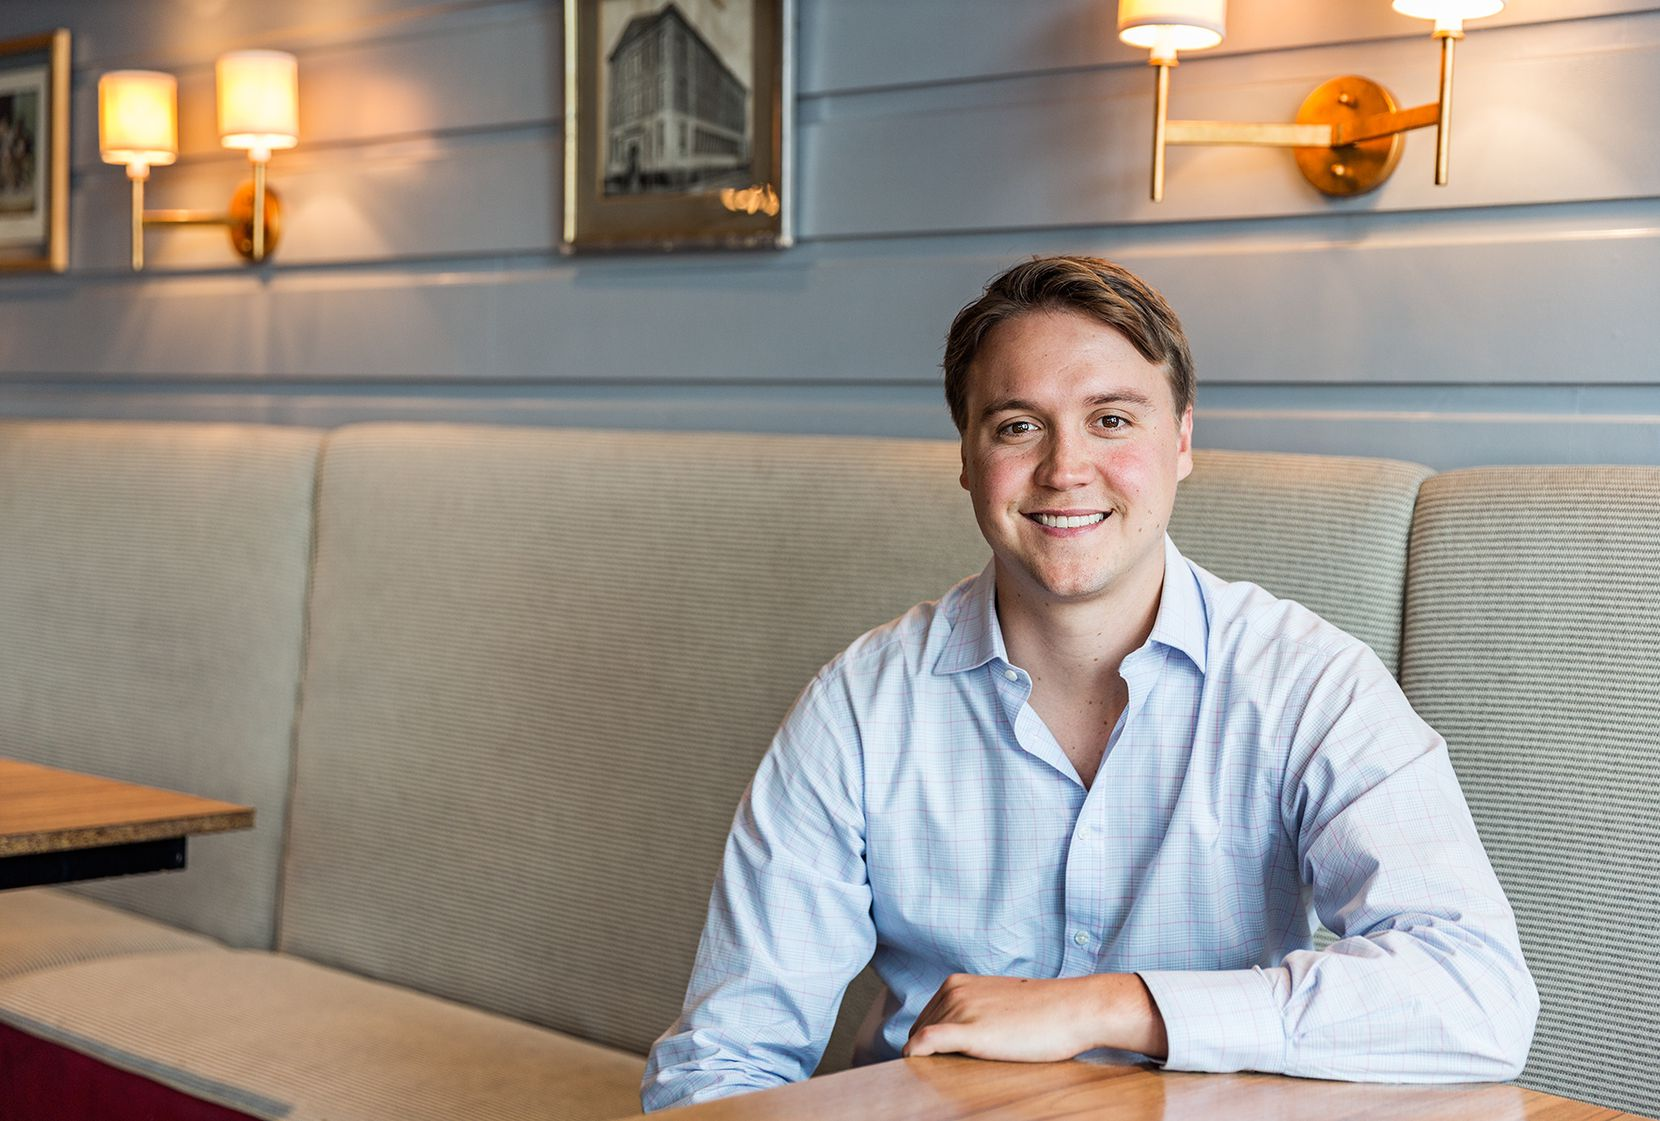 Hunter Pond, 28, CEO of East Hampton Sandwich Co.